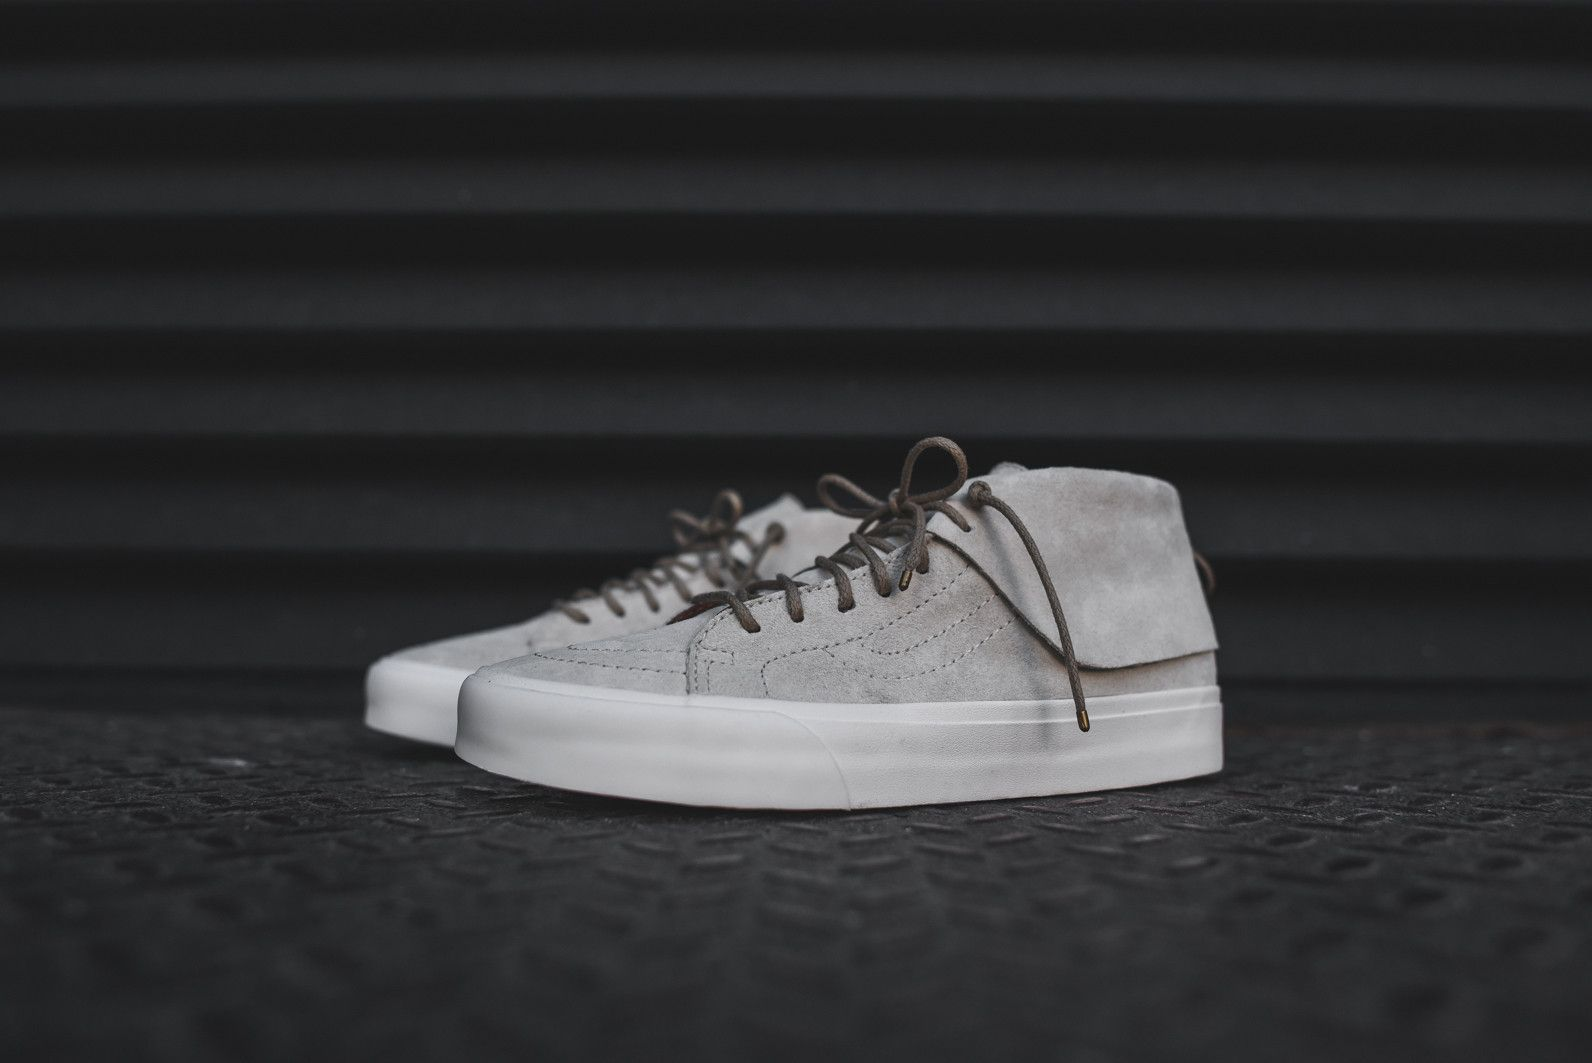 Vans CA Sk8Mid Moc  Oyster Gray Mens Sneakers Suede